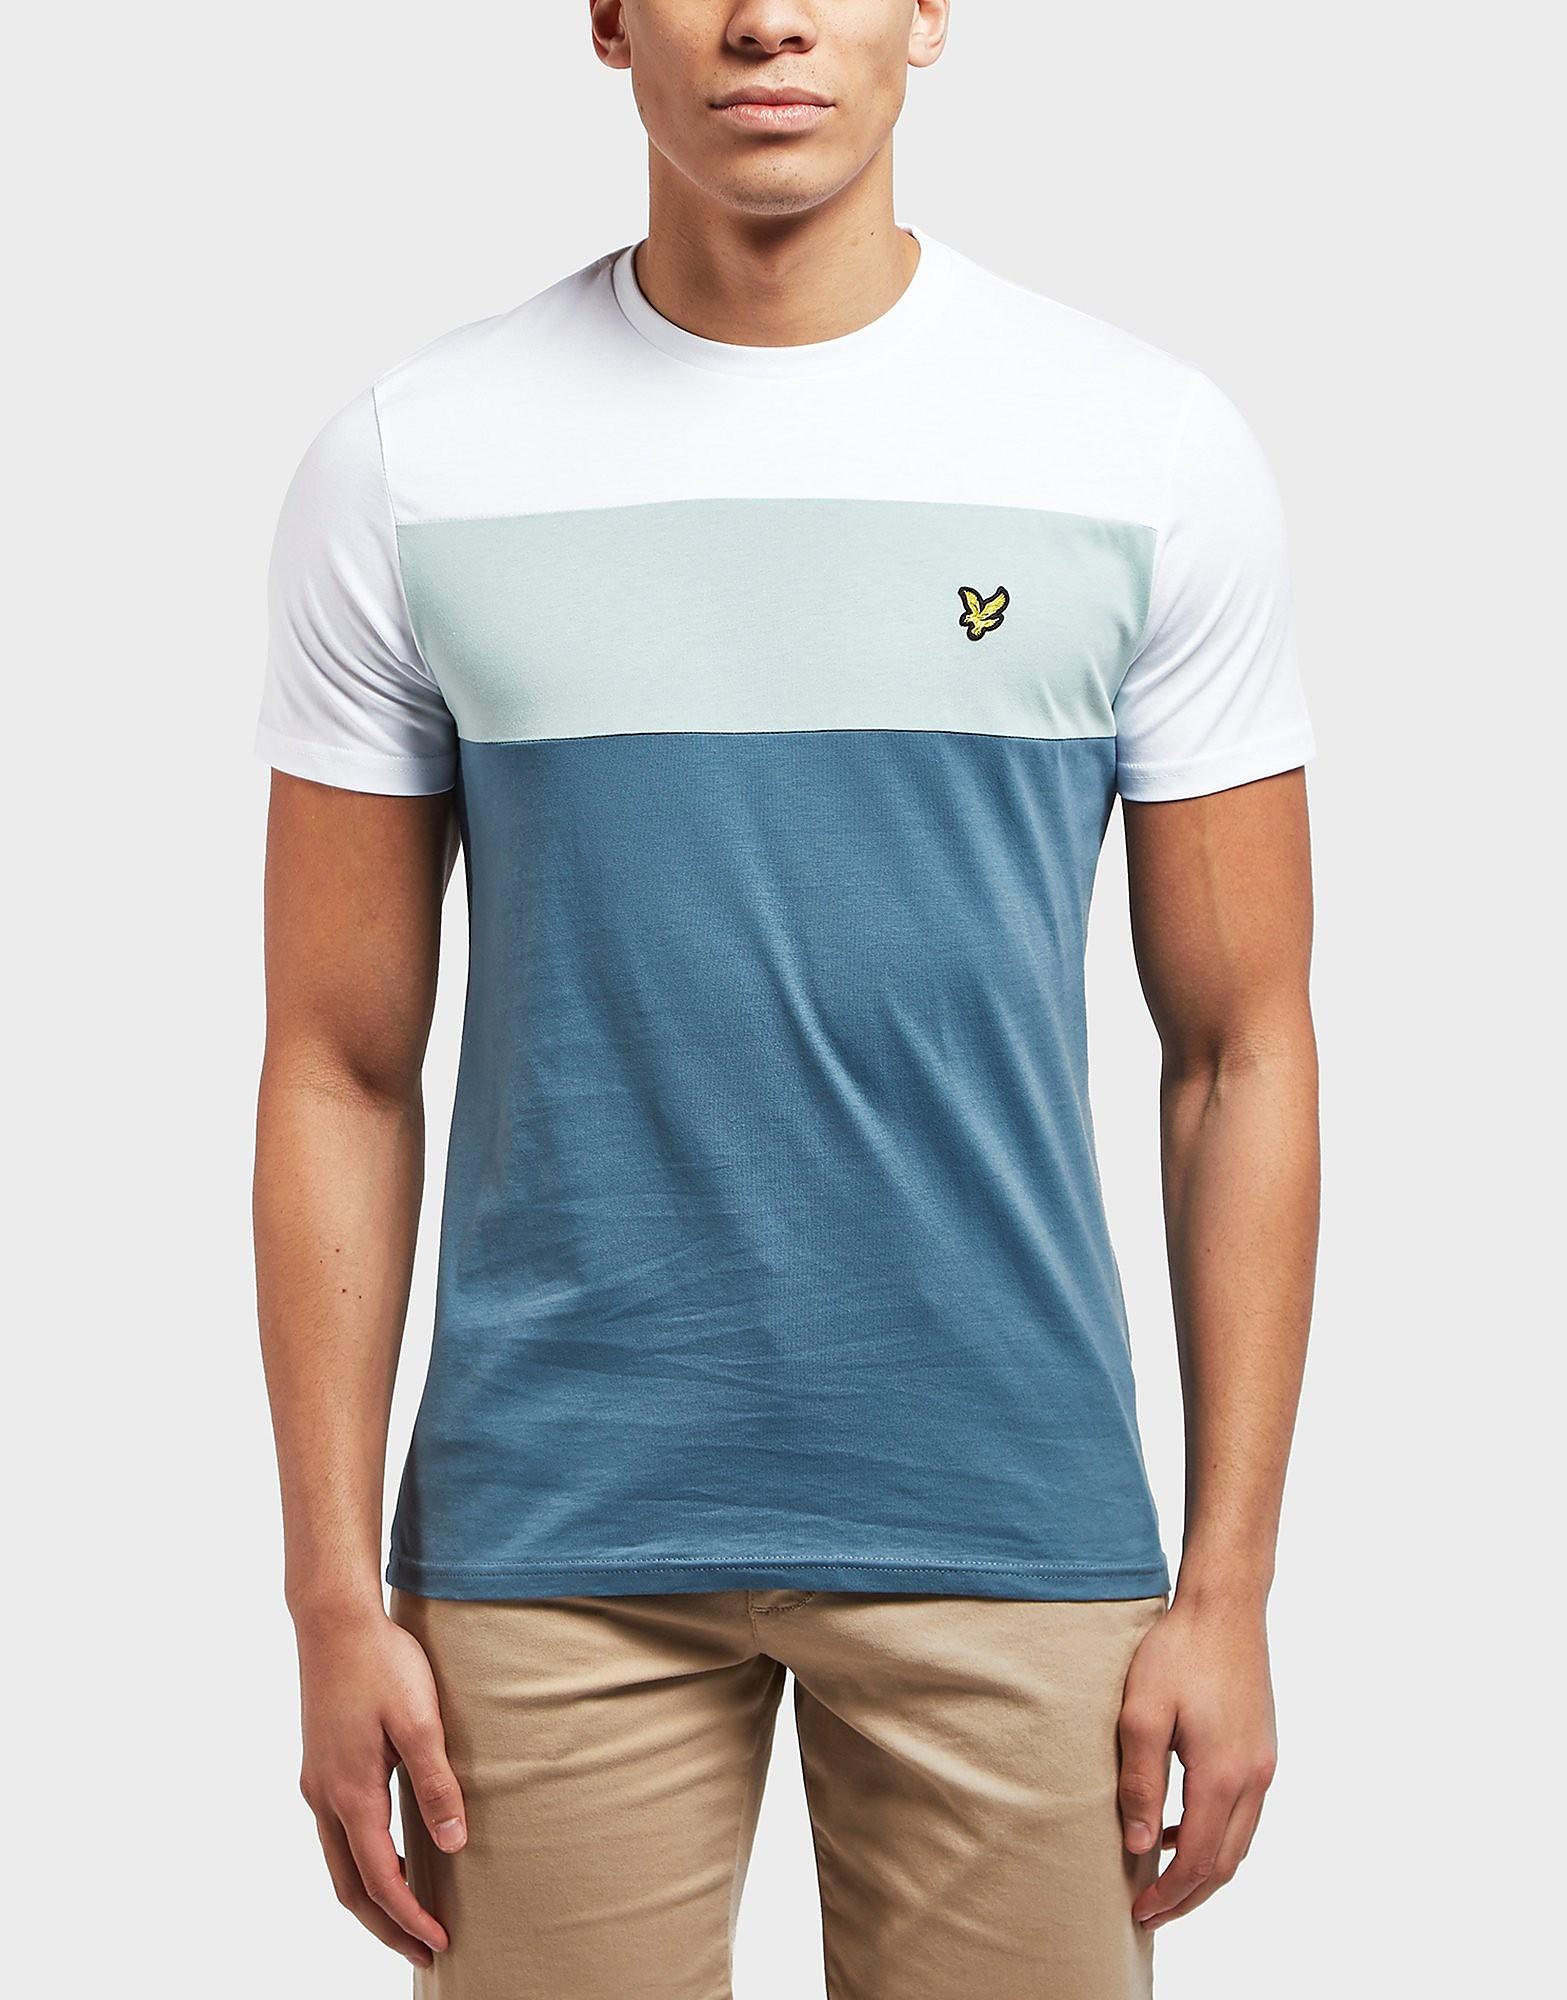 Lyle & Scott Casuals Short Sleeve T-Shirt - Exclusive